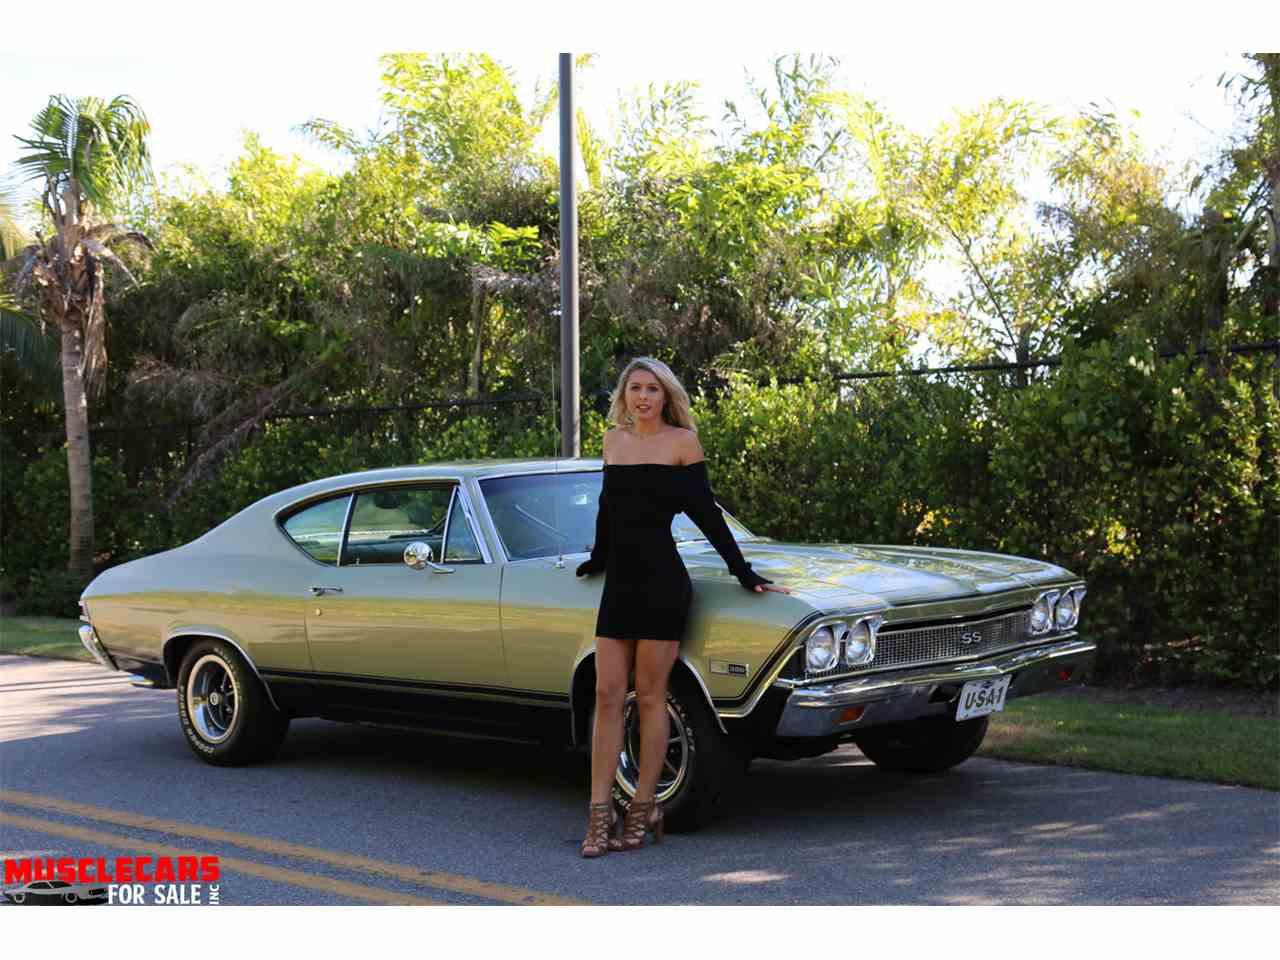 1968 Chevrolet Chevelle for Sale | ClassicCars.com | CC-1051377